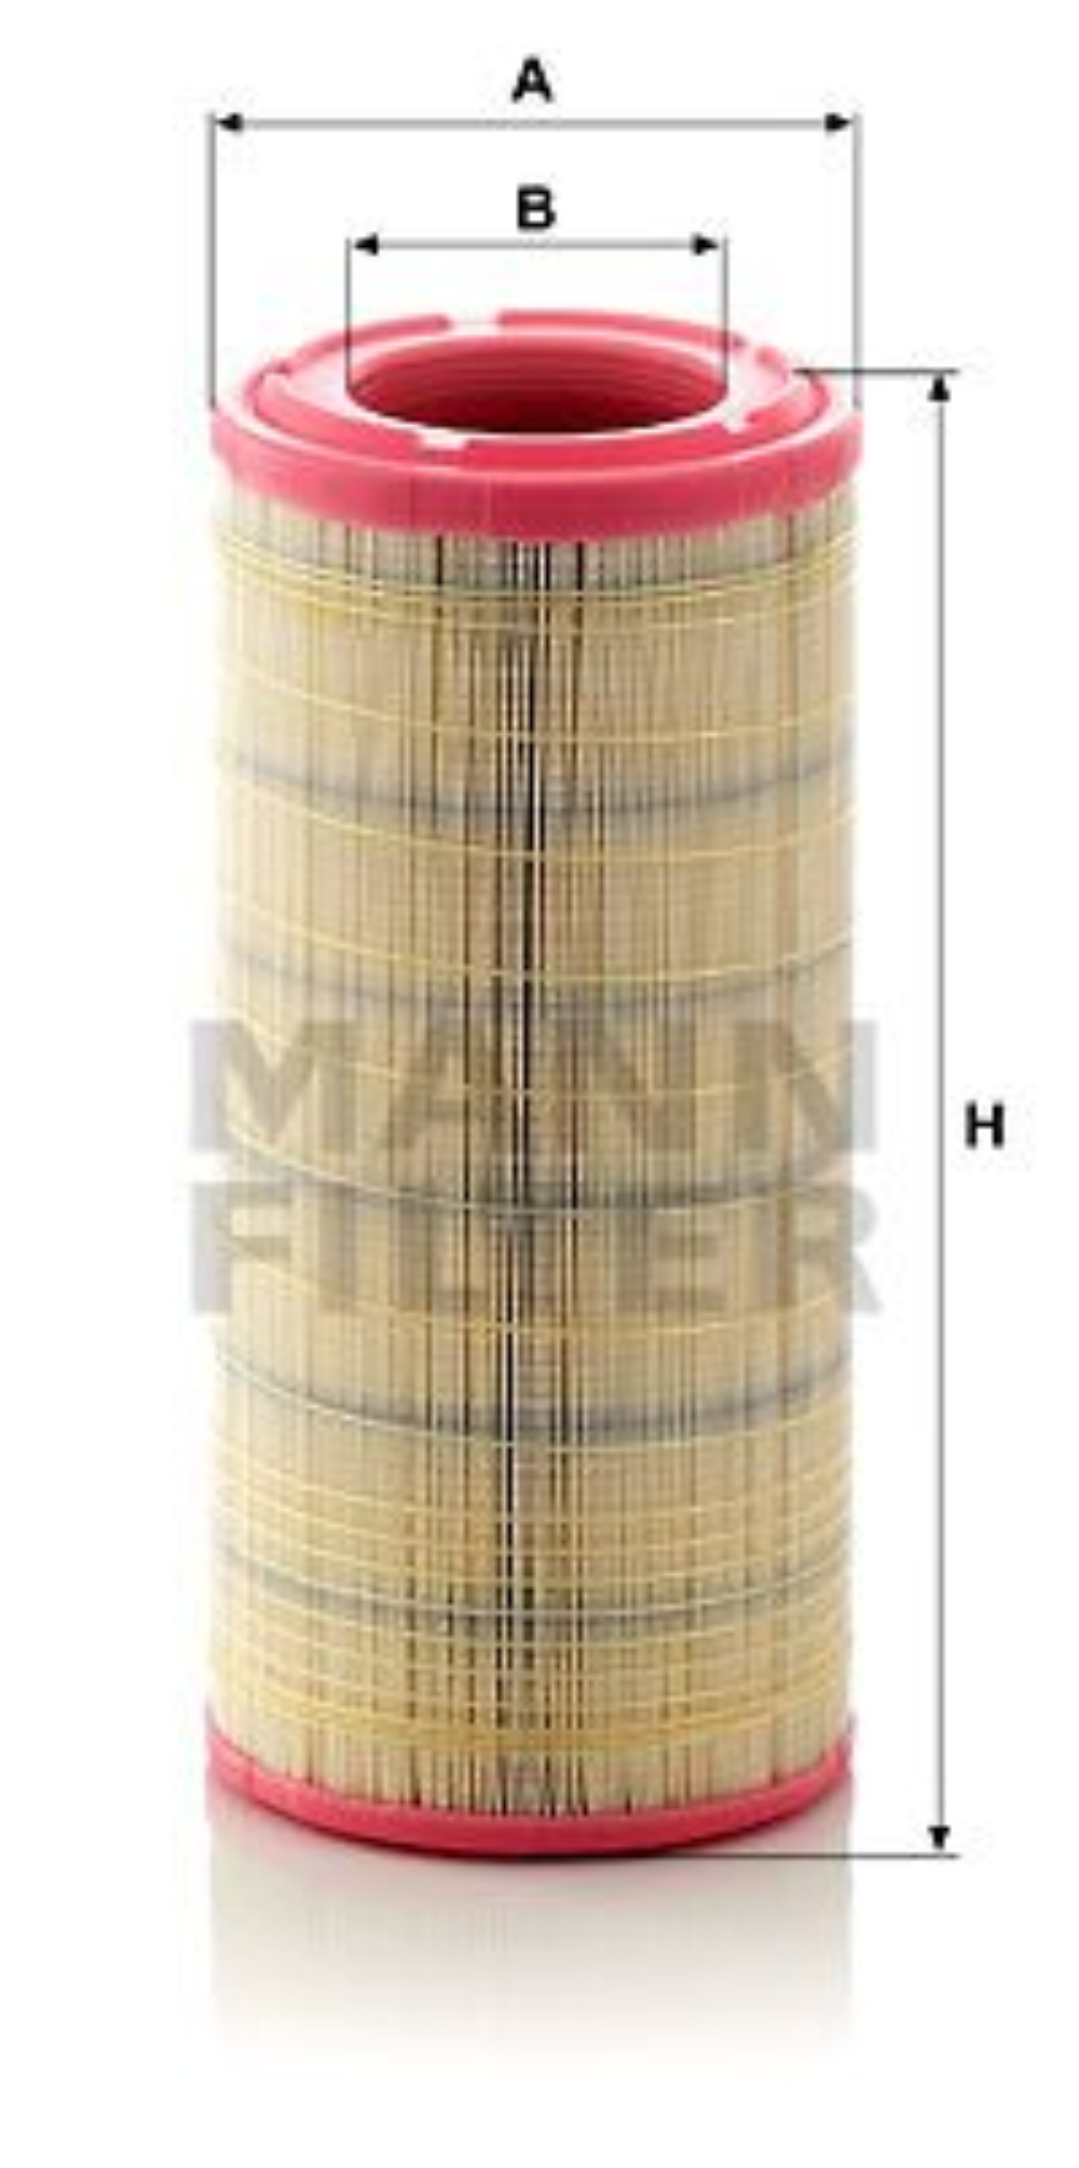 C 17 337/2 Luftfilter MANN-FILTER Test